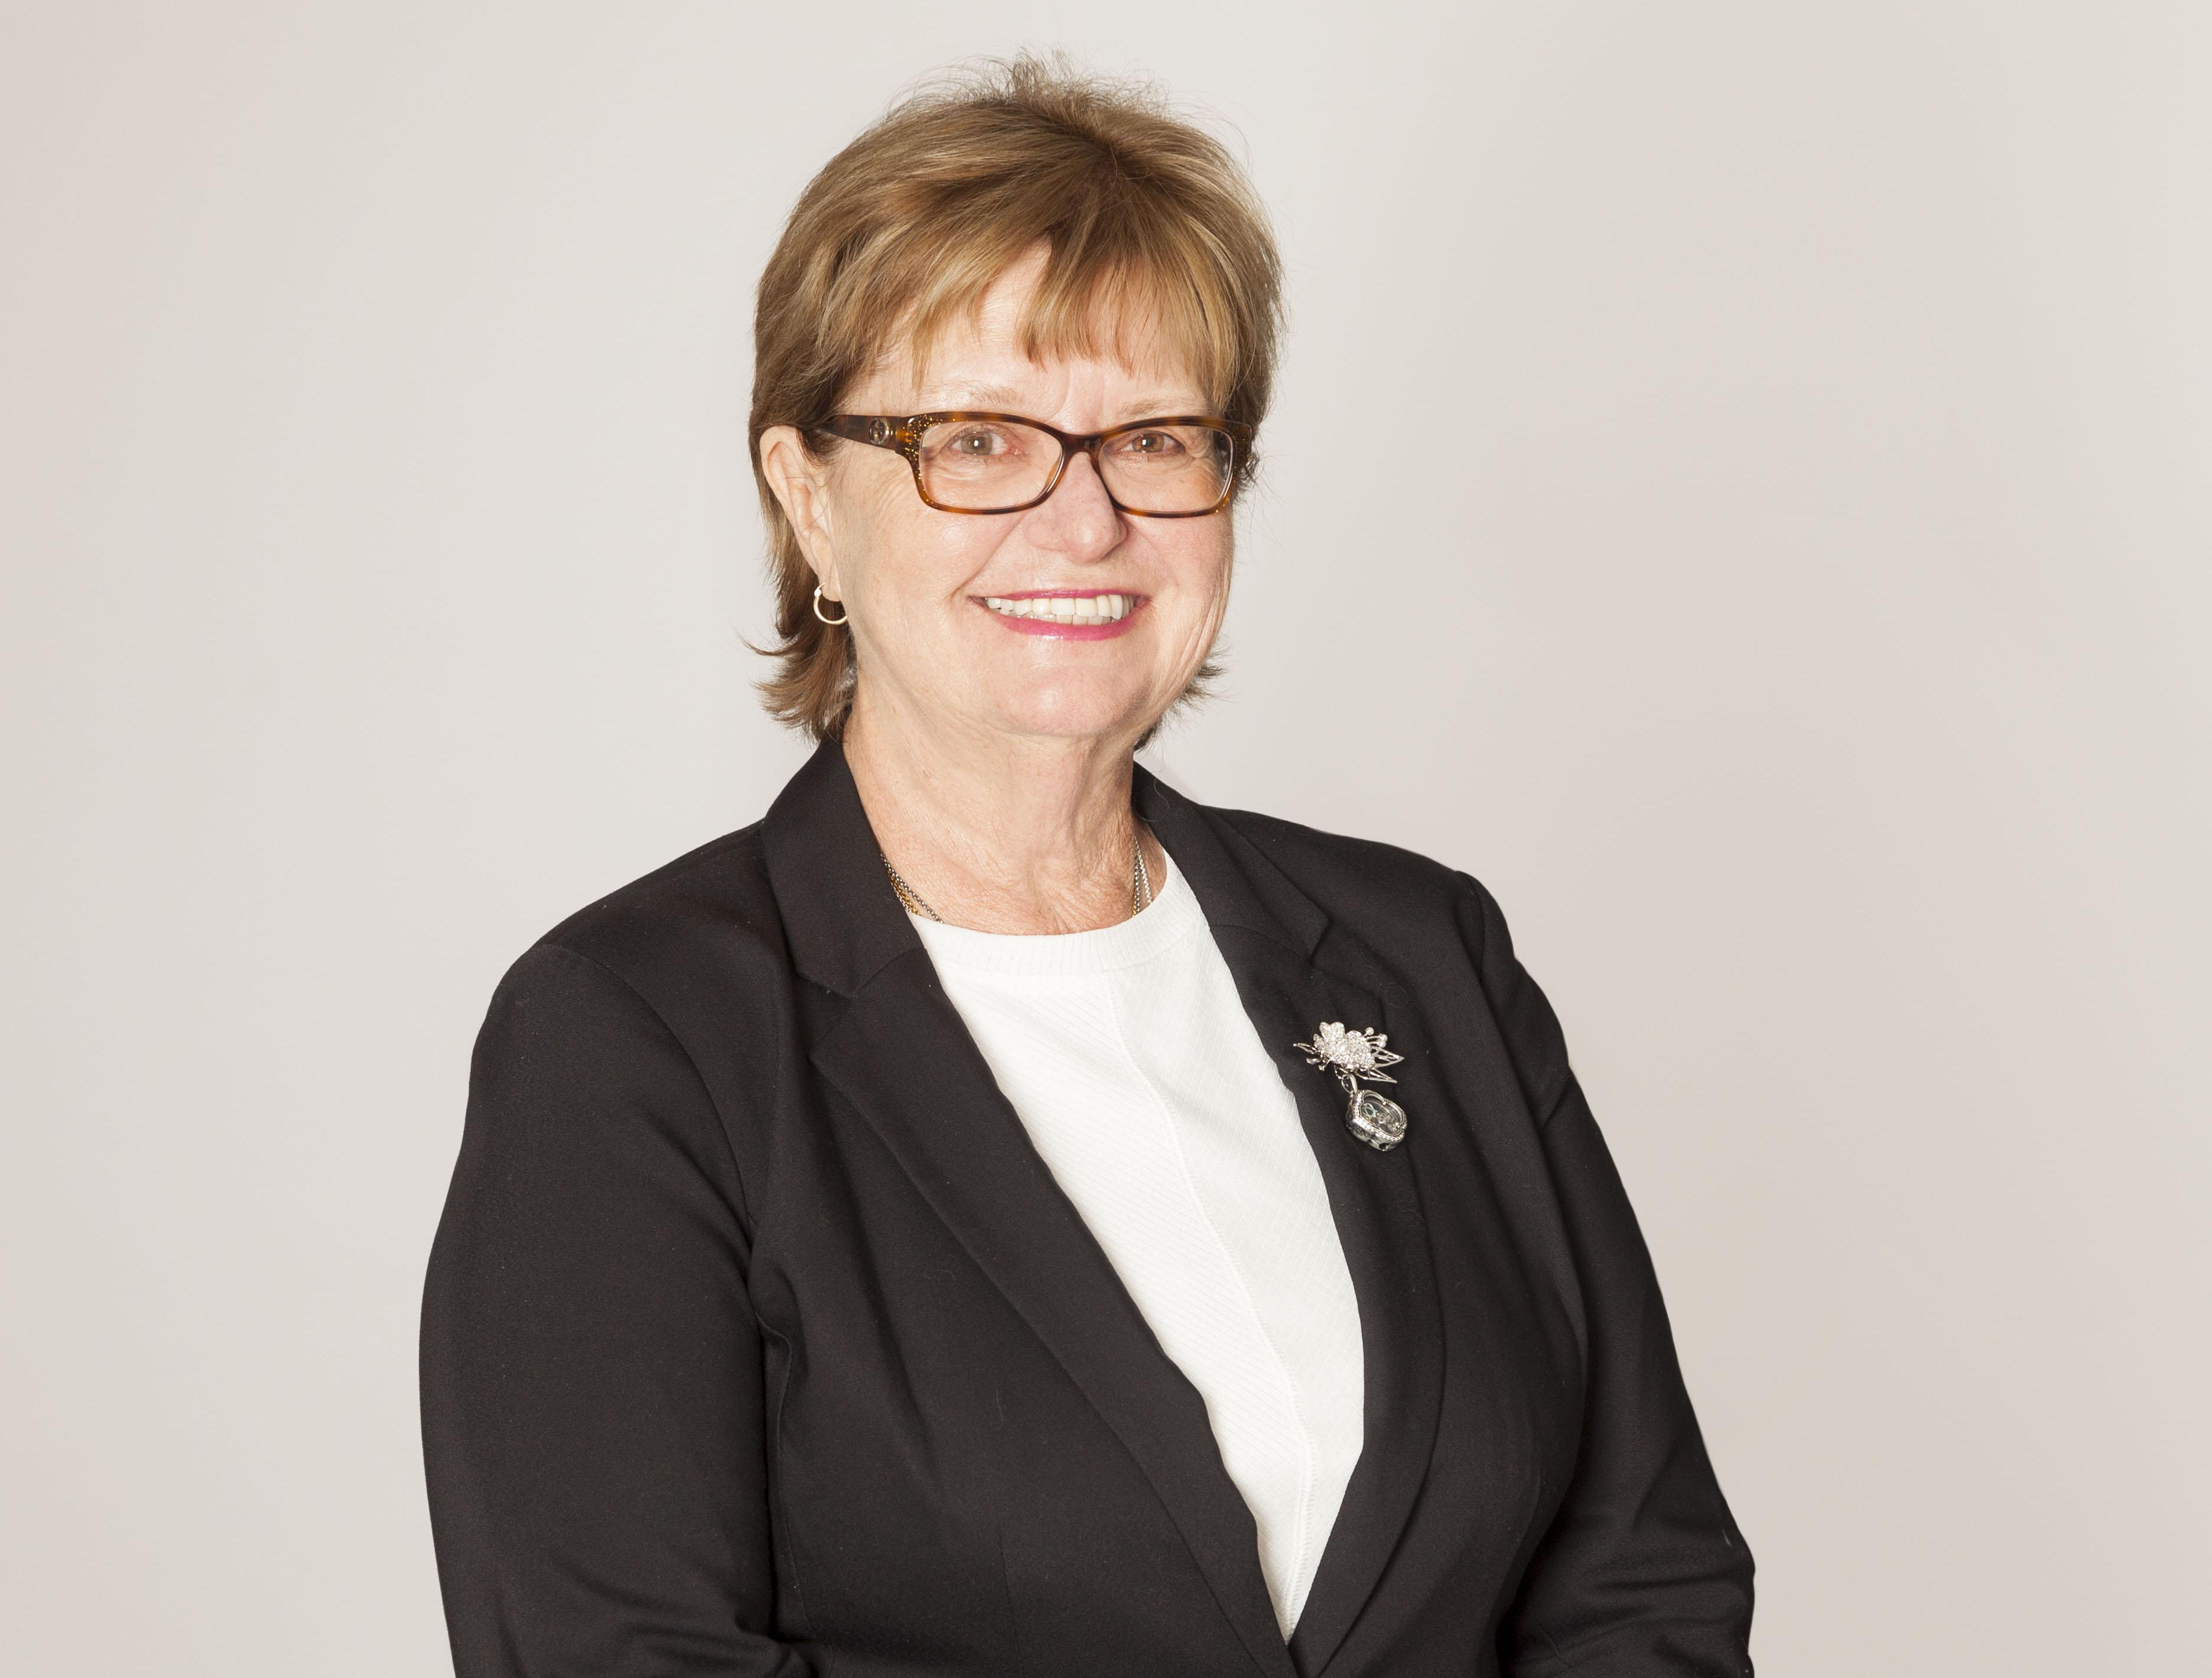 Linda G. Kassof